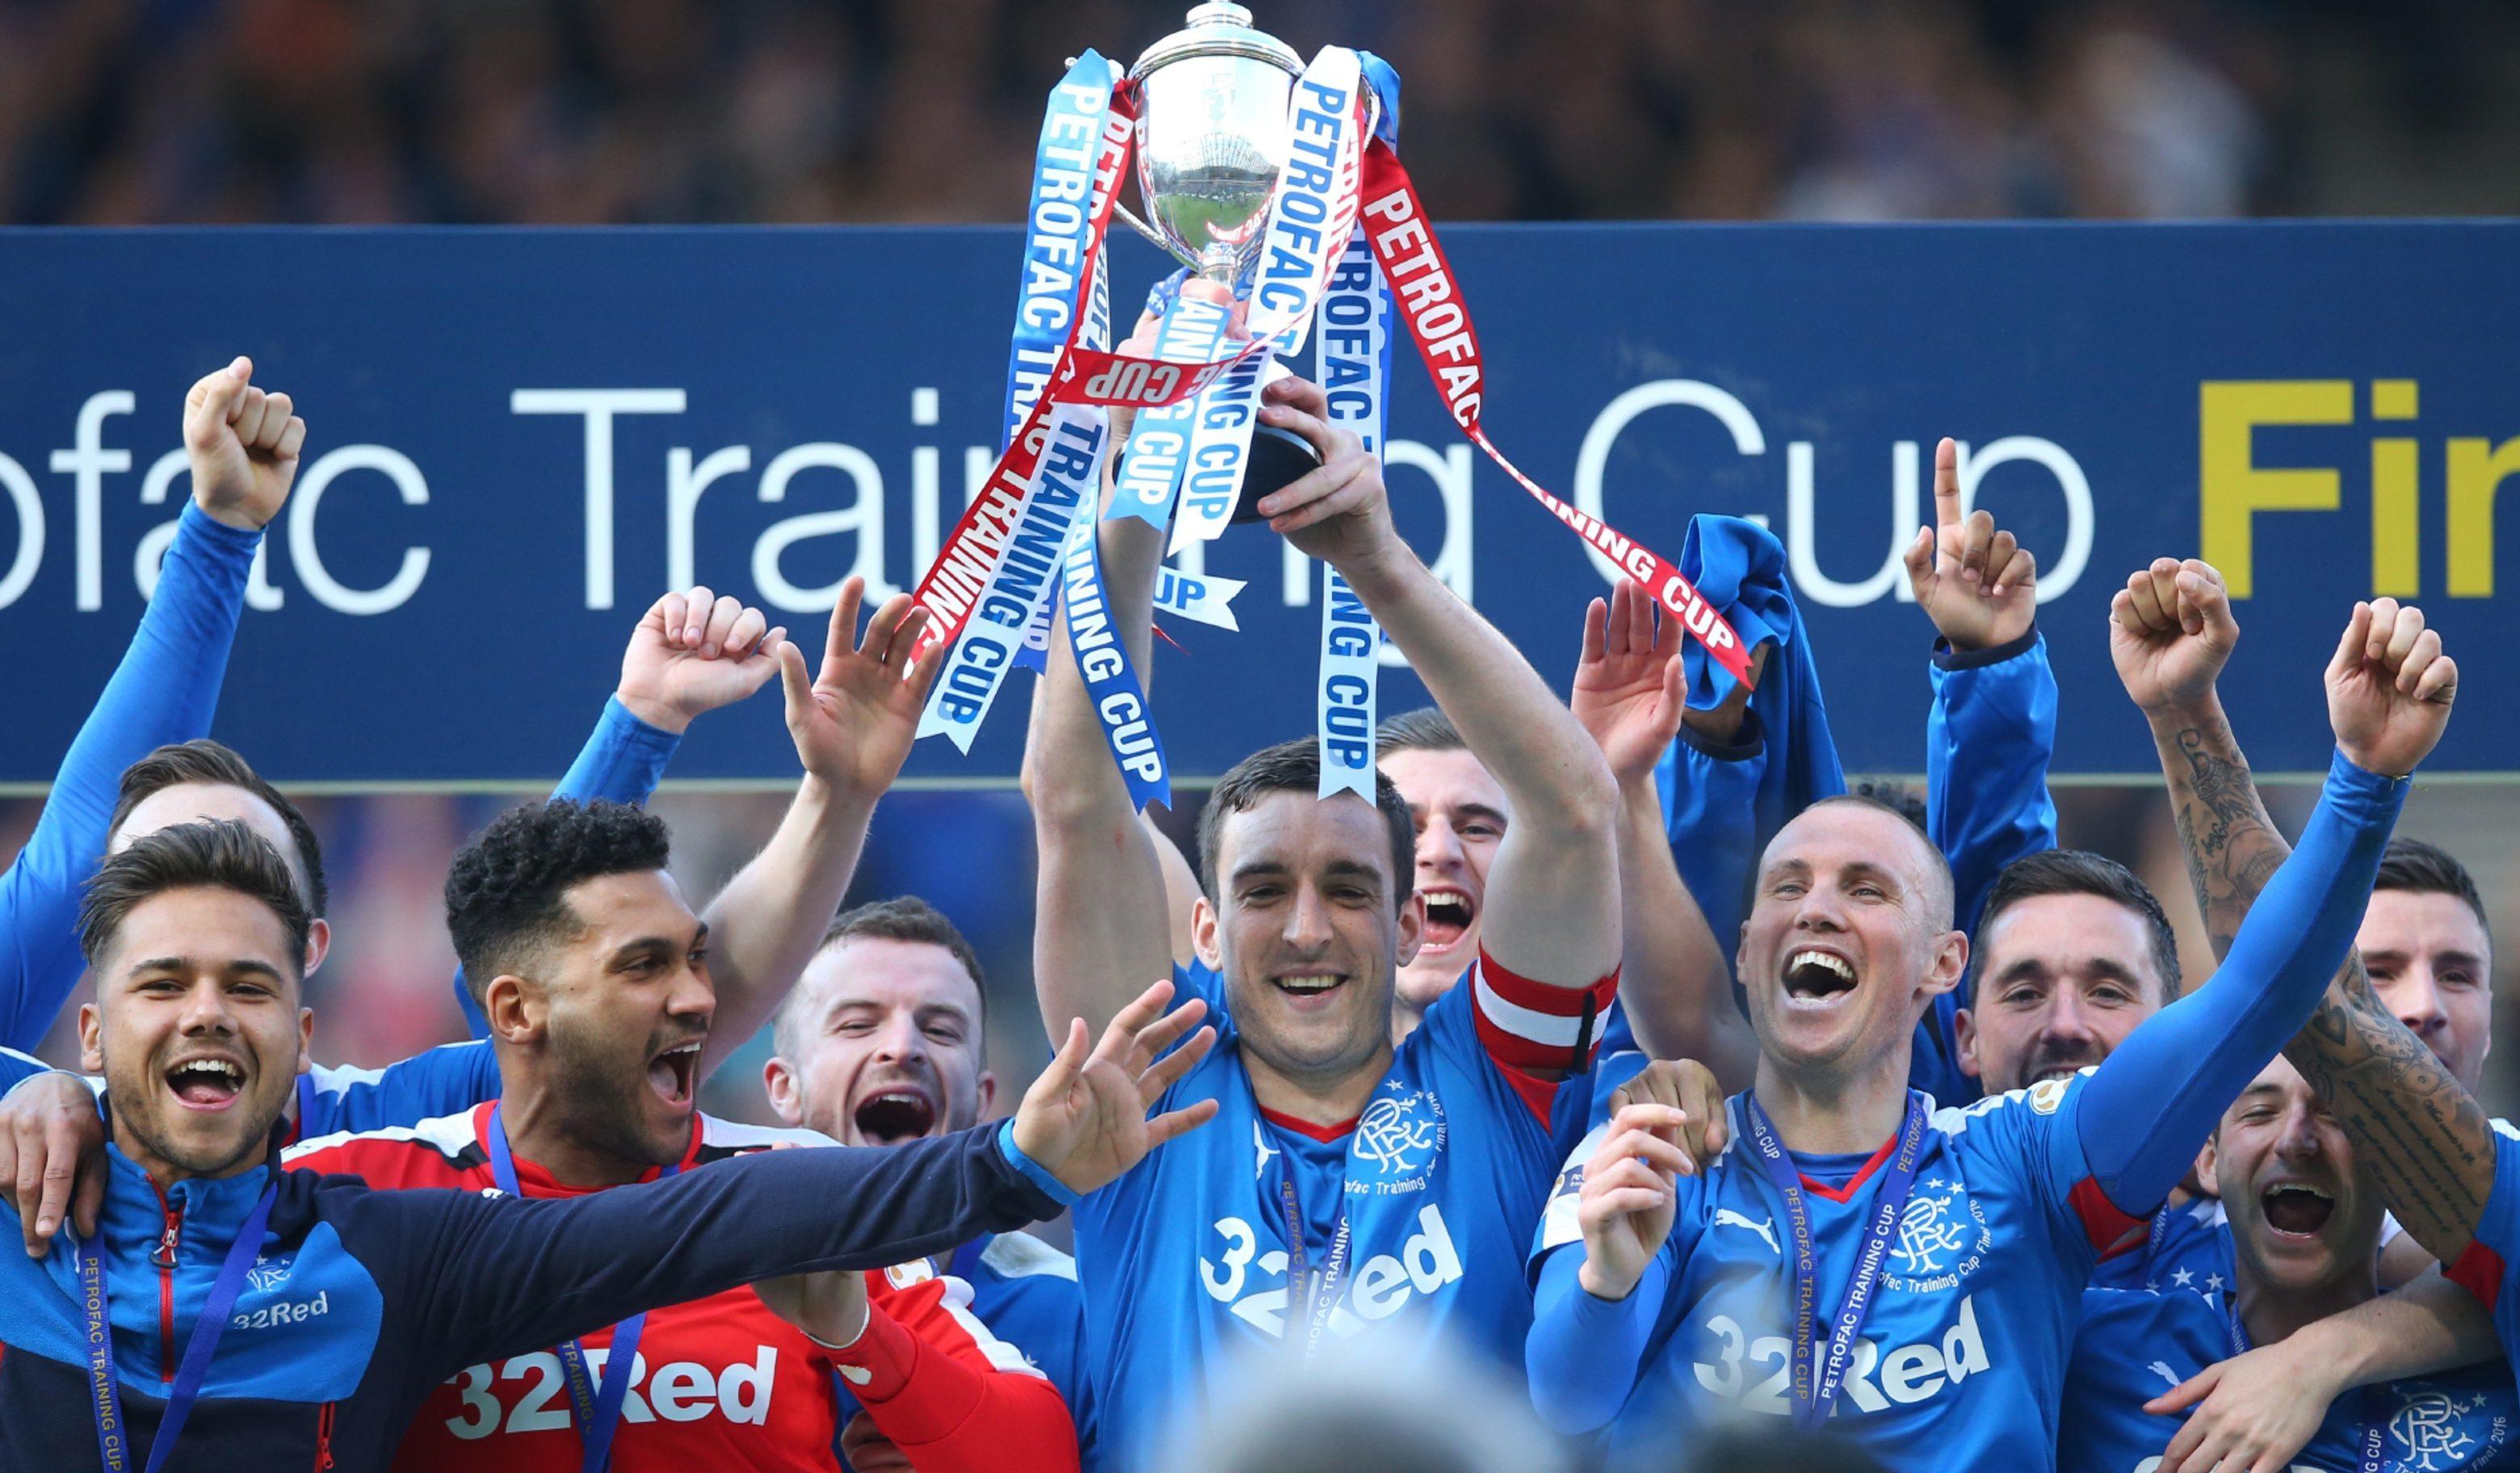 Rangers celebrate after winning last season's Petrofac Cup